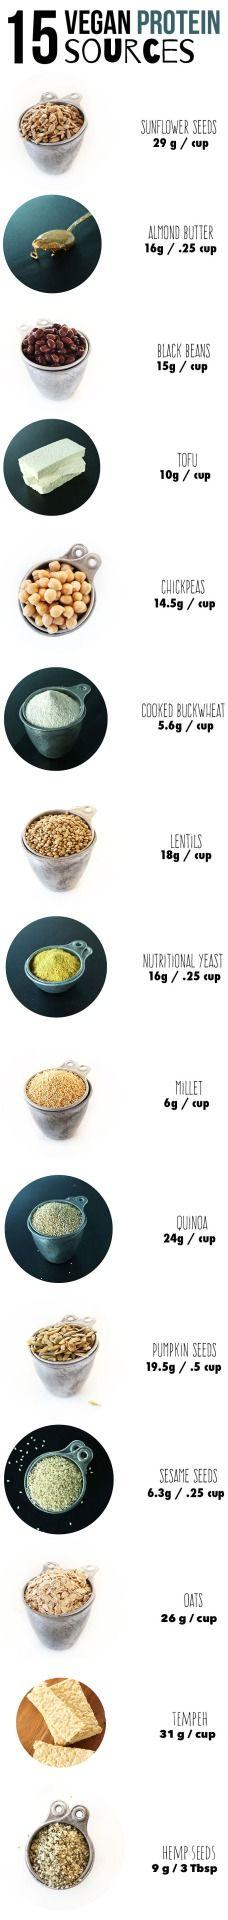 15 vegan protein sources.